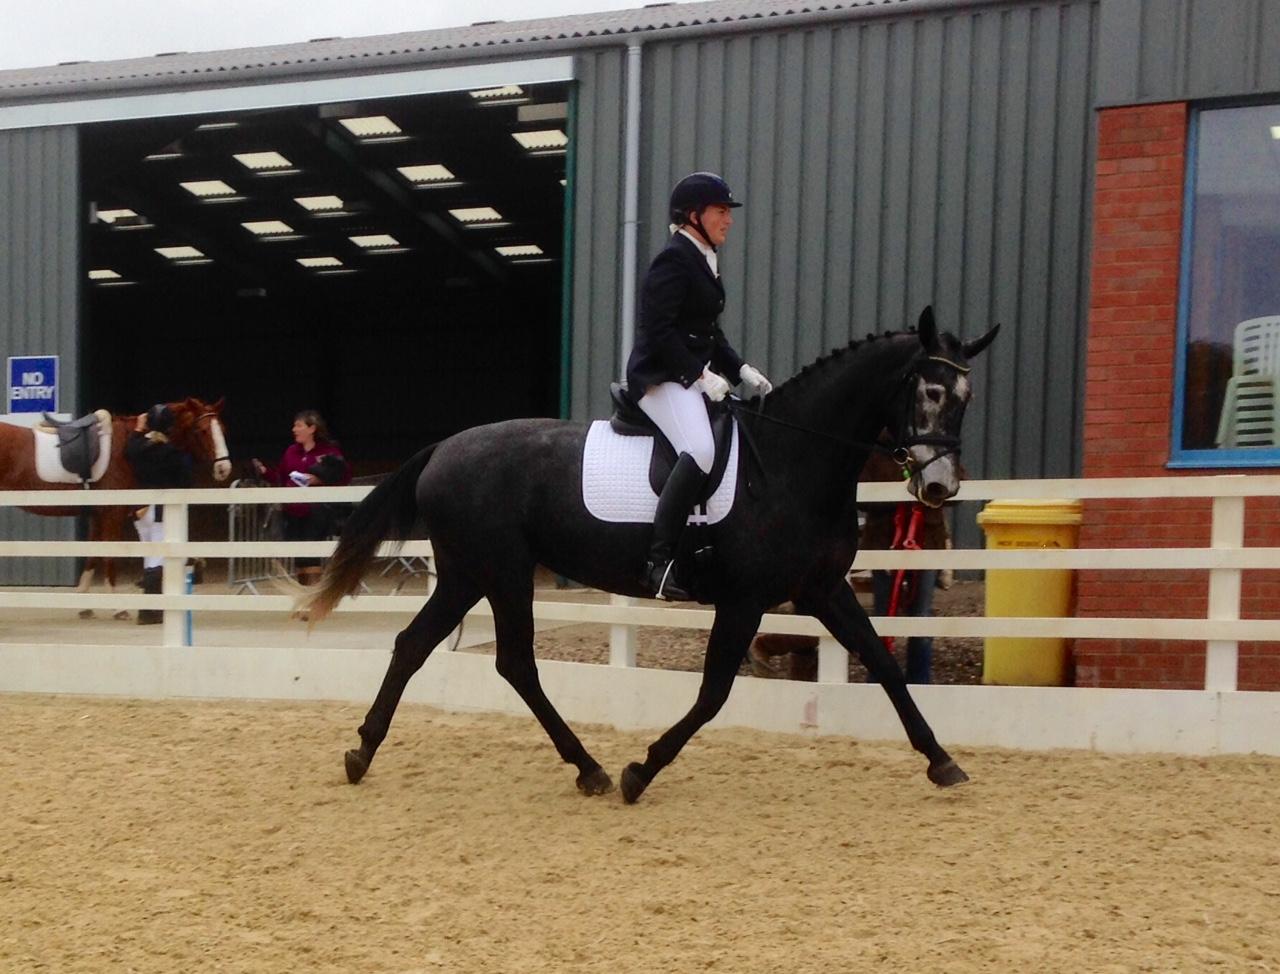 http://www.hanoverianstud.com/images/horses_for_sale/newpics/Marmite1-new.jpg